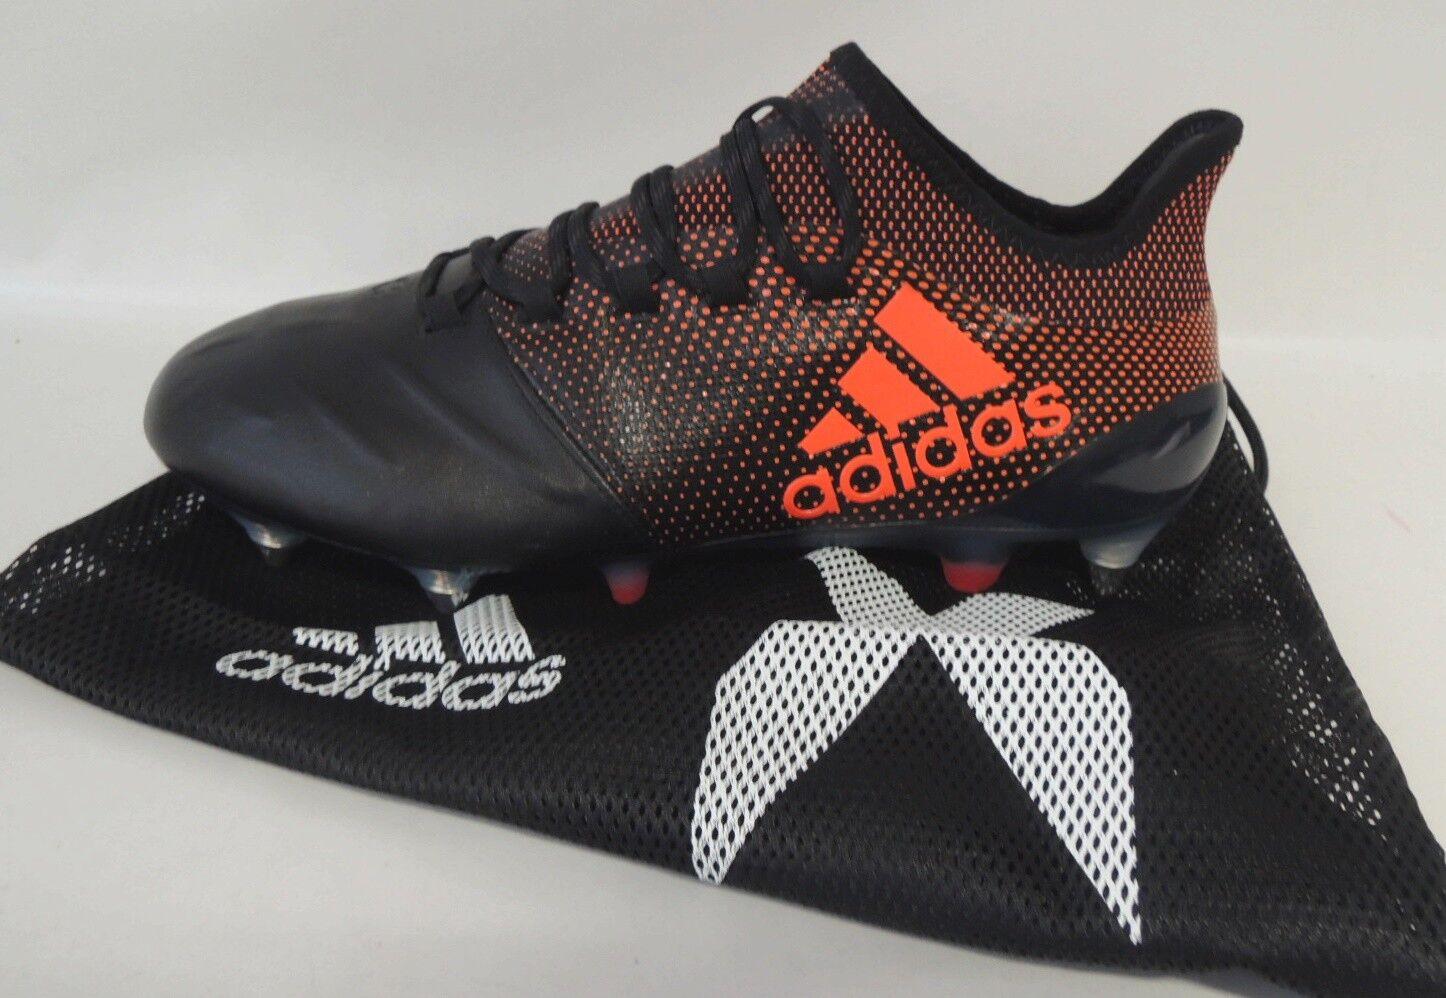 NEU adidas X 17.1 SG Leather 41 1 3 Profi Profi Profi Stollen Nocken Fußballschuhe S82320 7efbf8